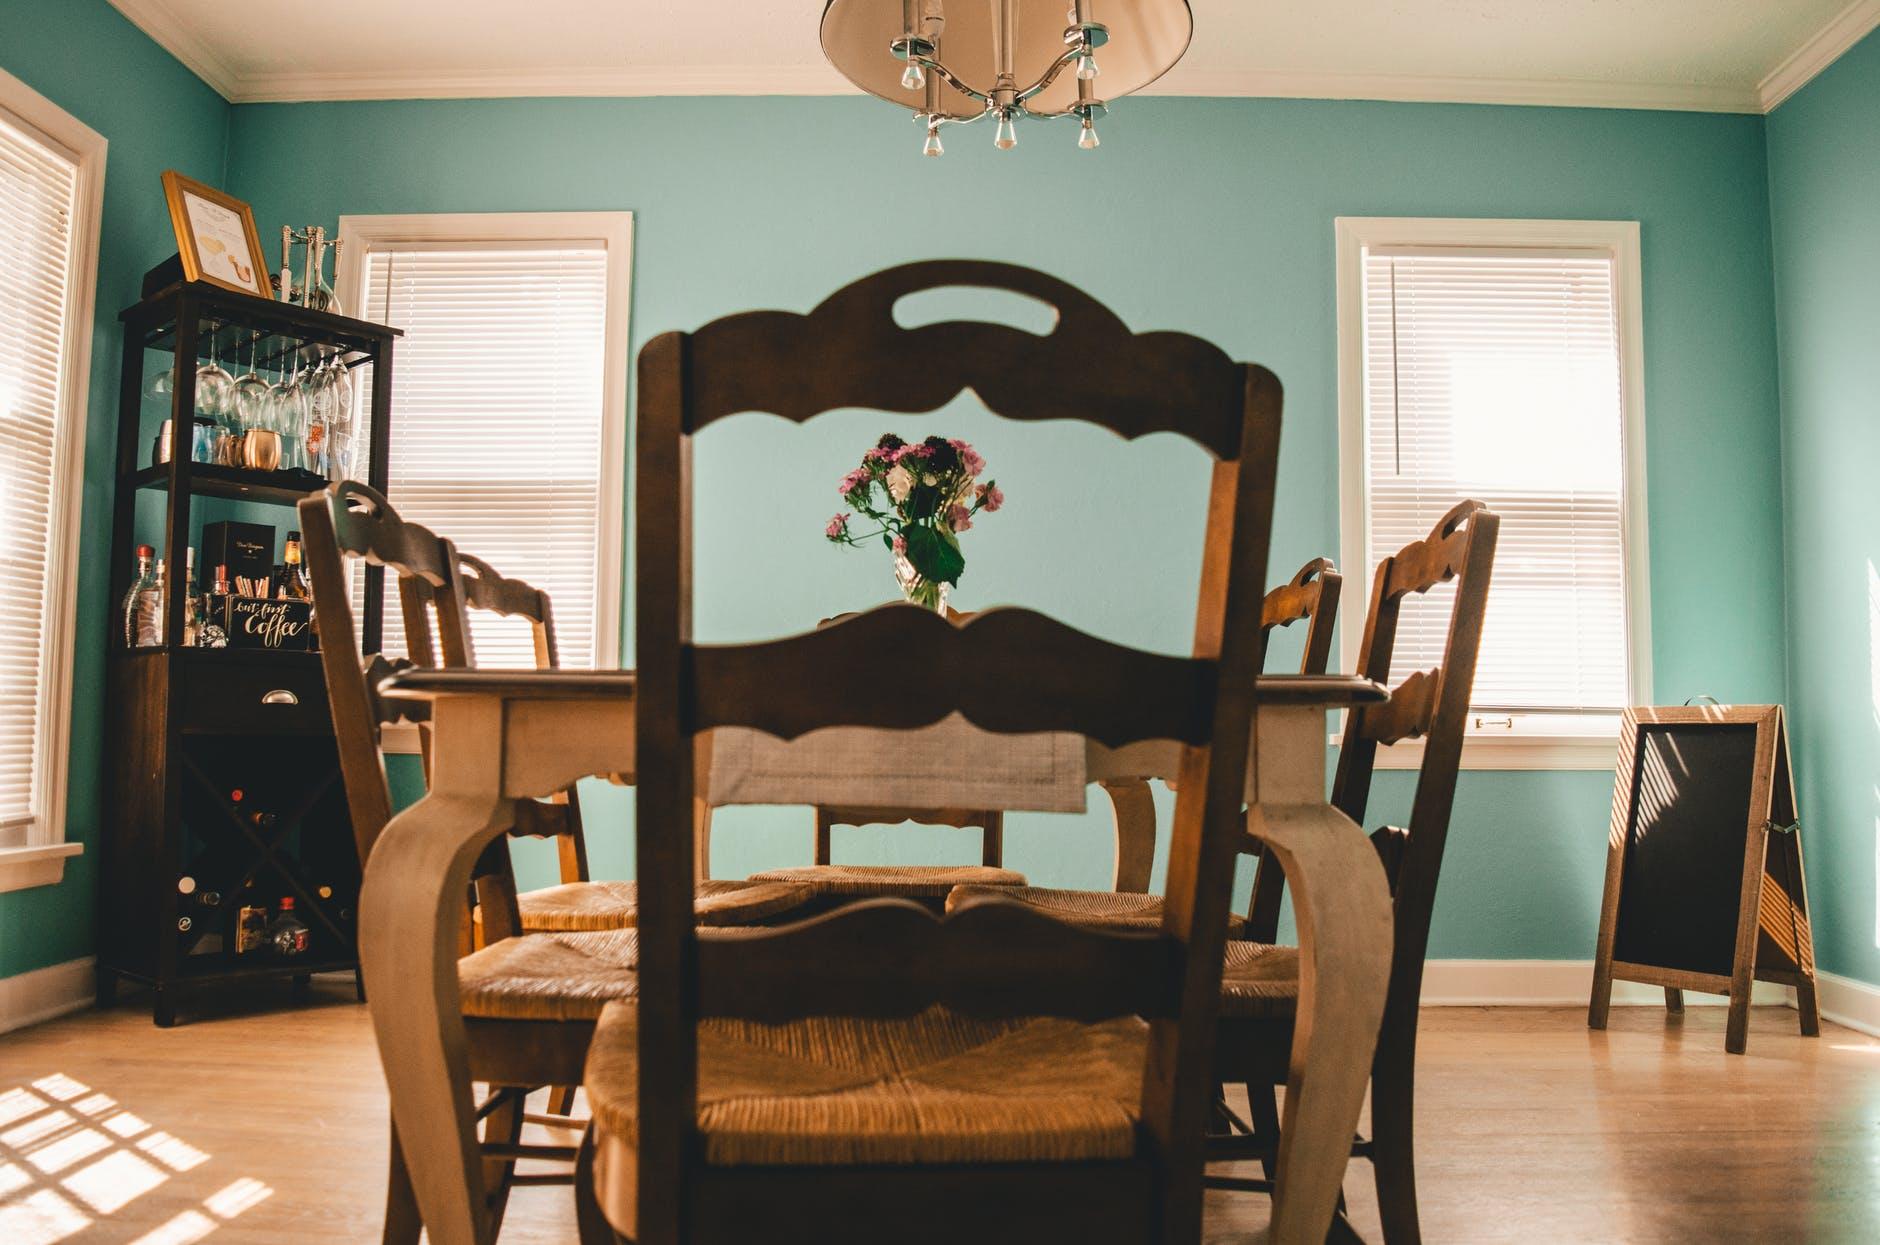 interior of dining room